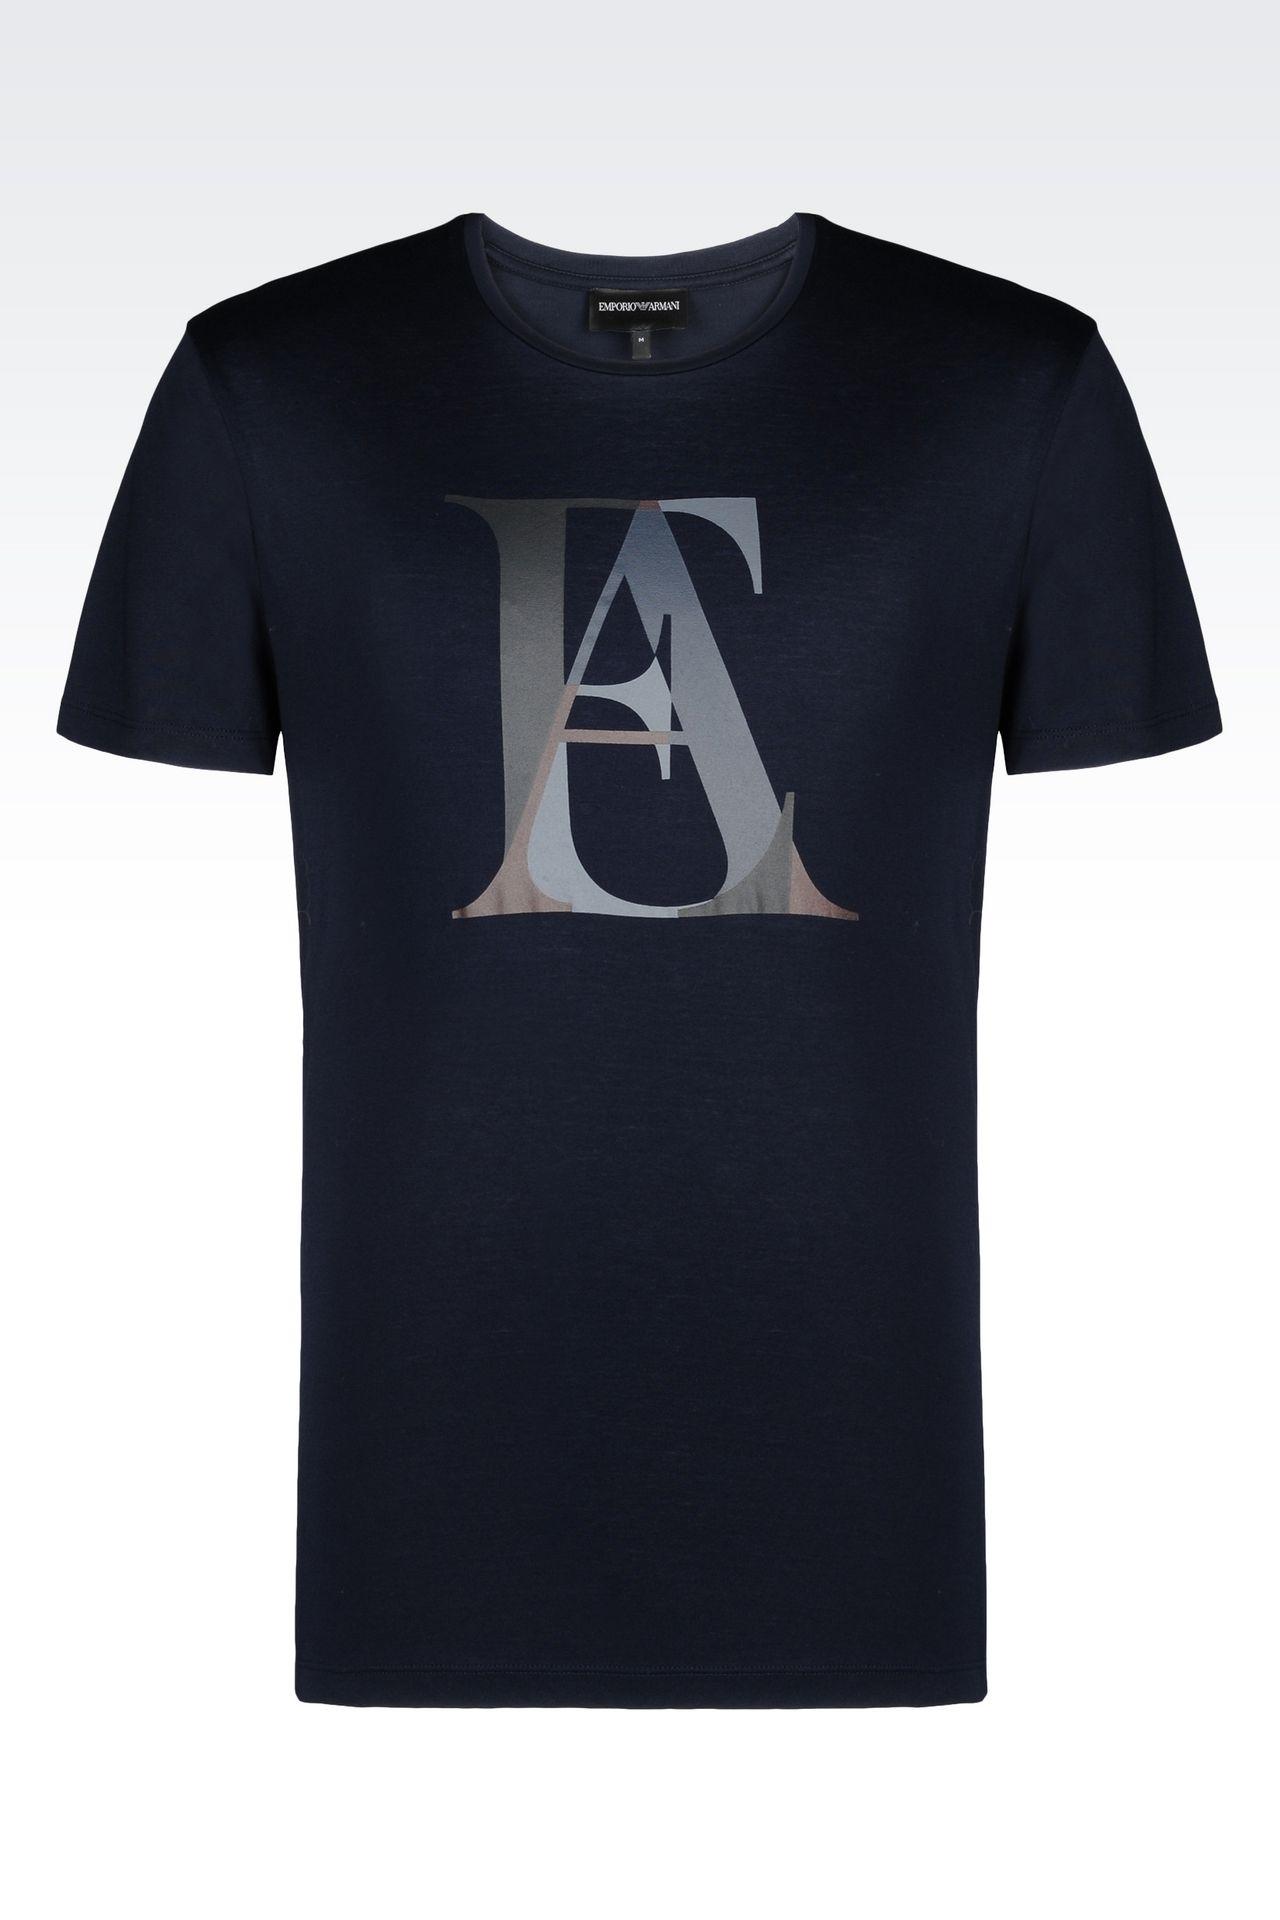 jersey t shirt short sleeve t shirts men by armani 0. Black Bedroom Furniture Sets. Home Design Ideas